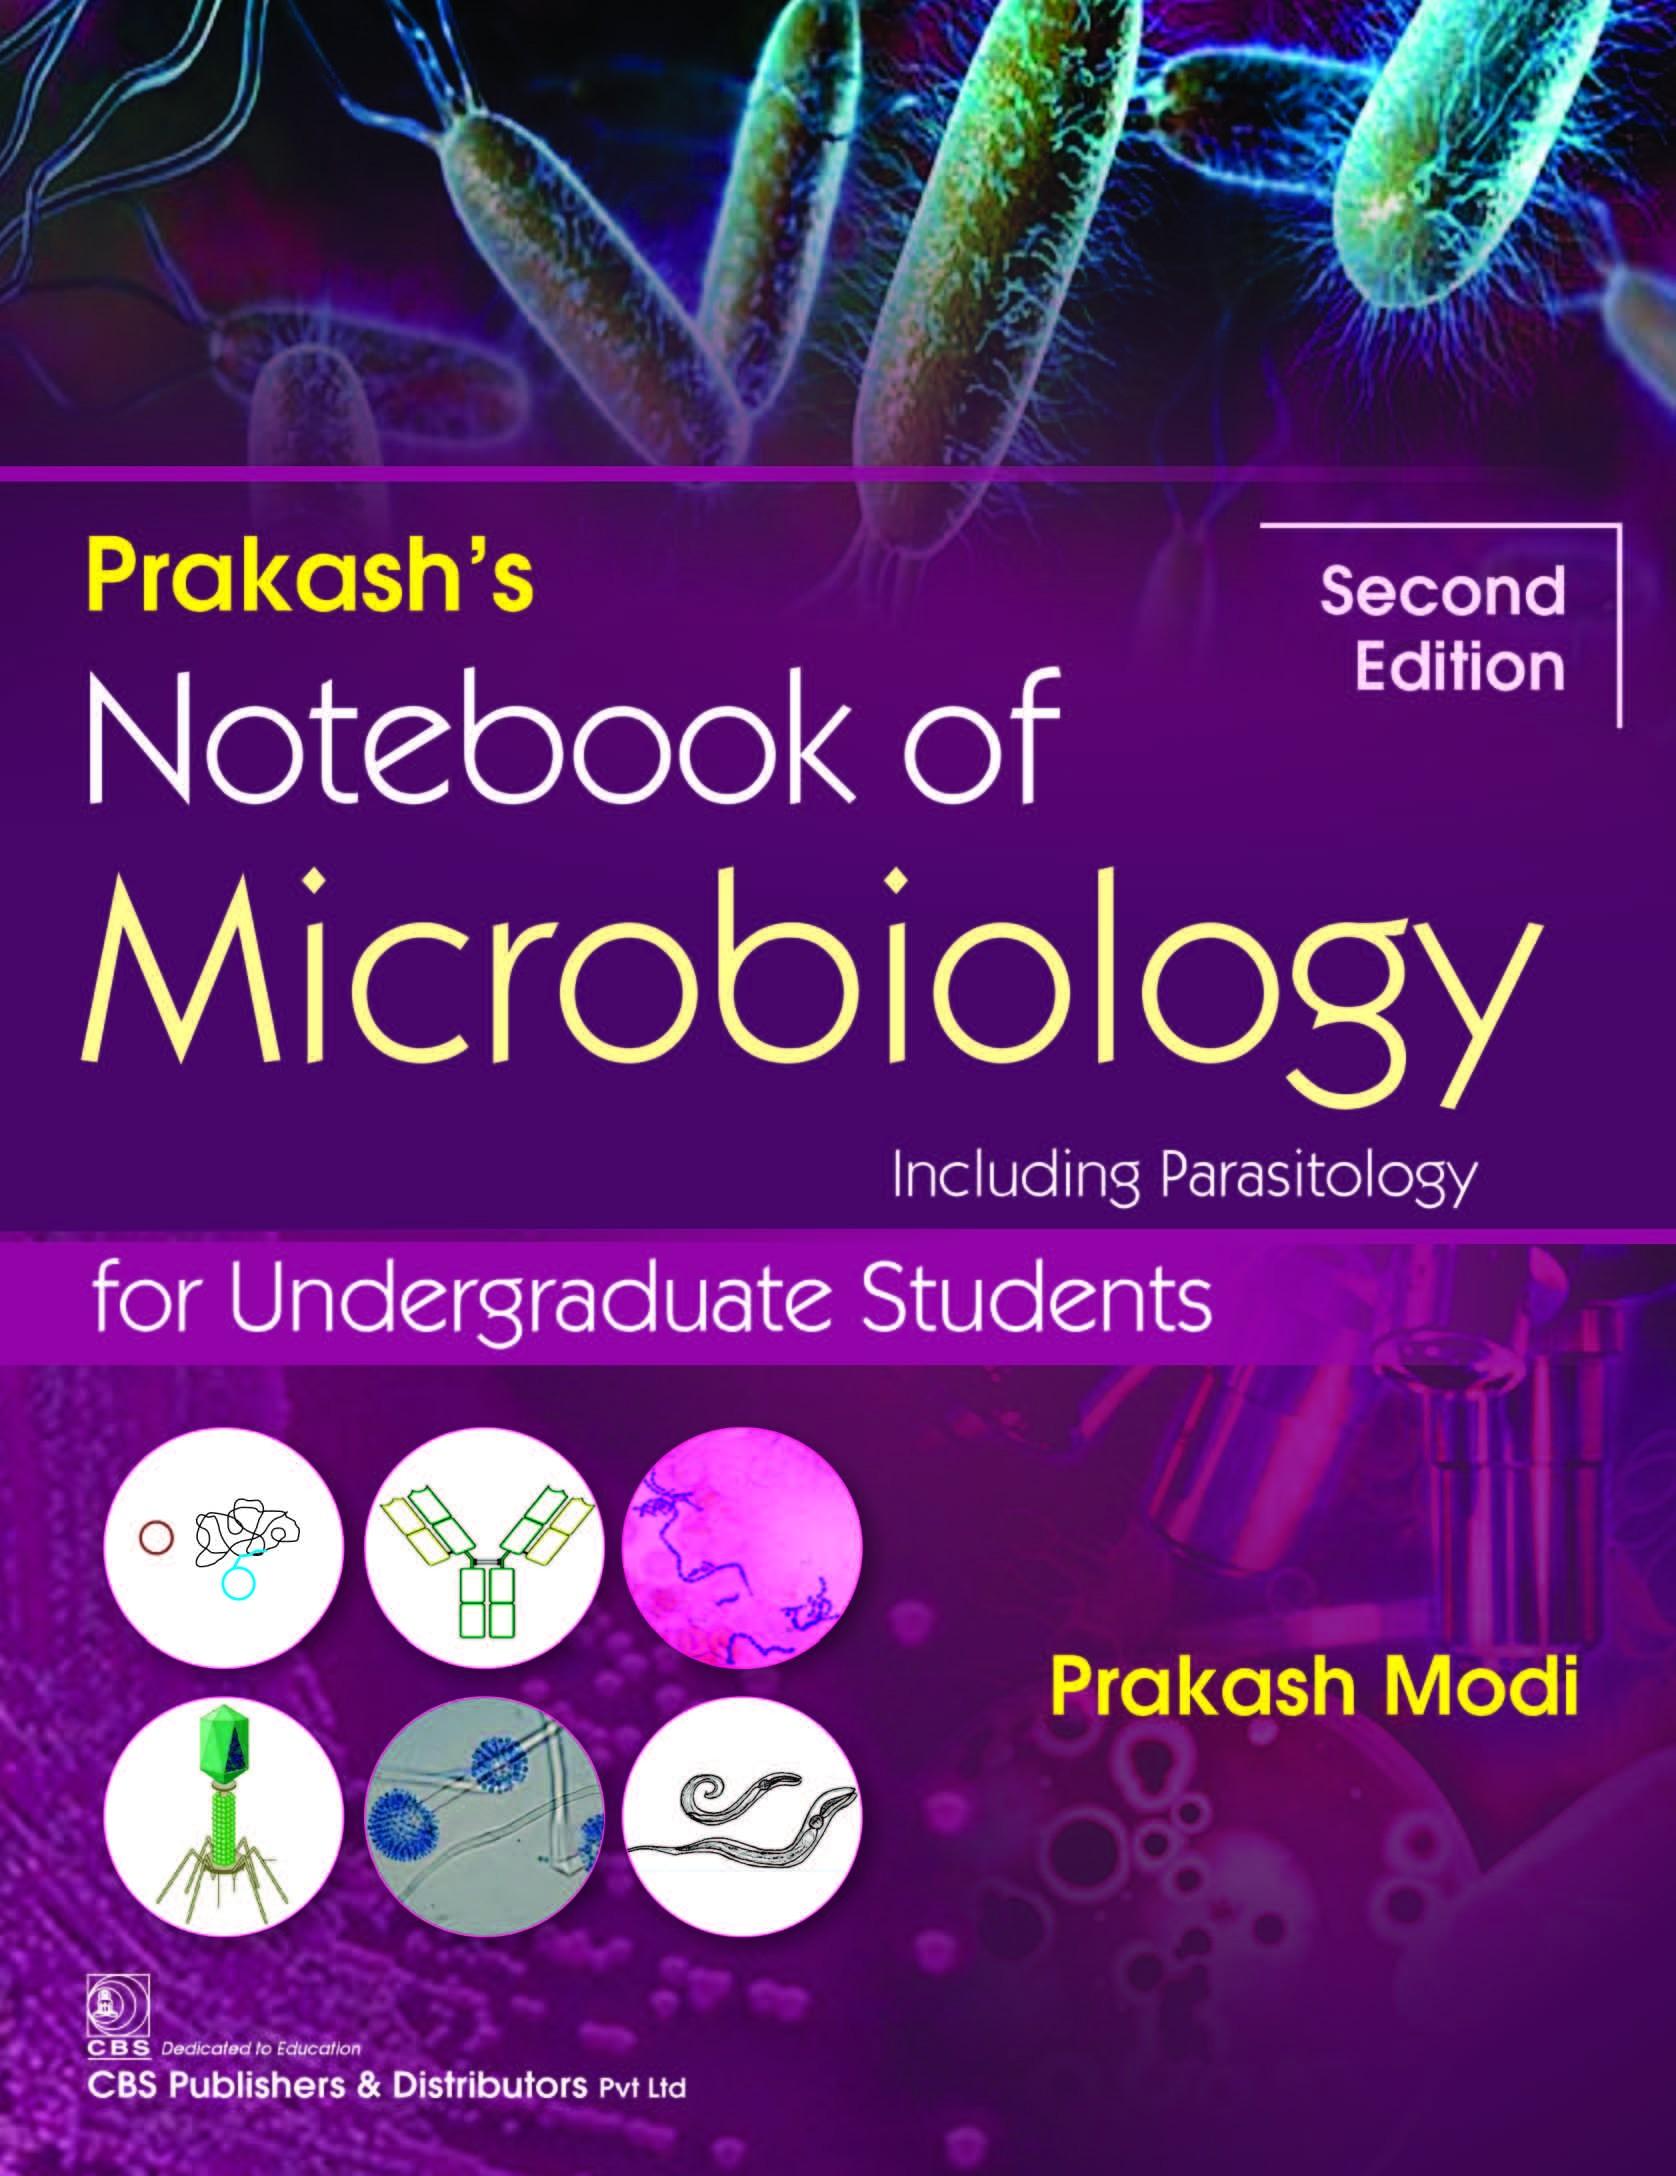 Prakash's Notebook of Microbiology including Parasitology for Undergraduate Students, 2/e